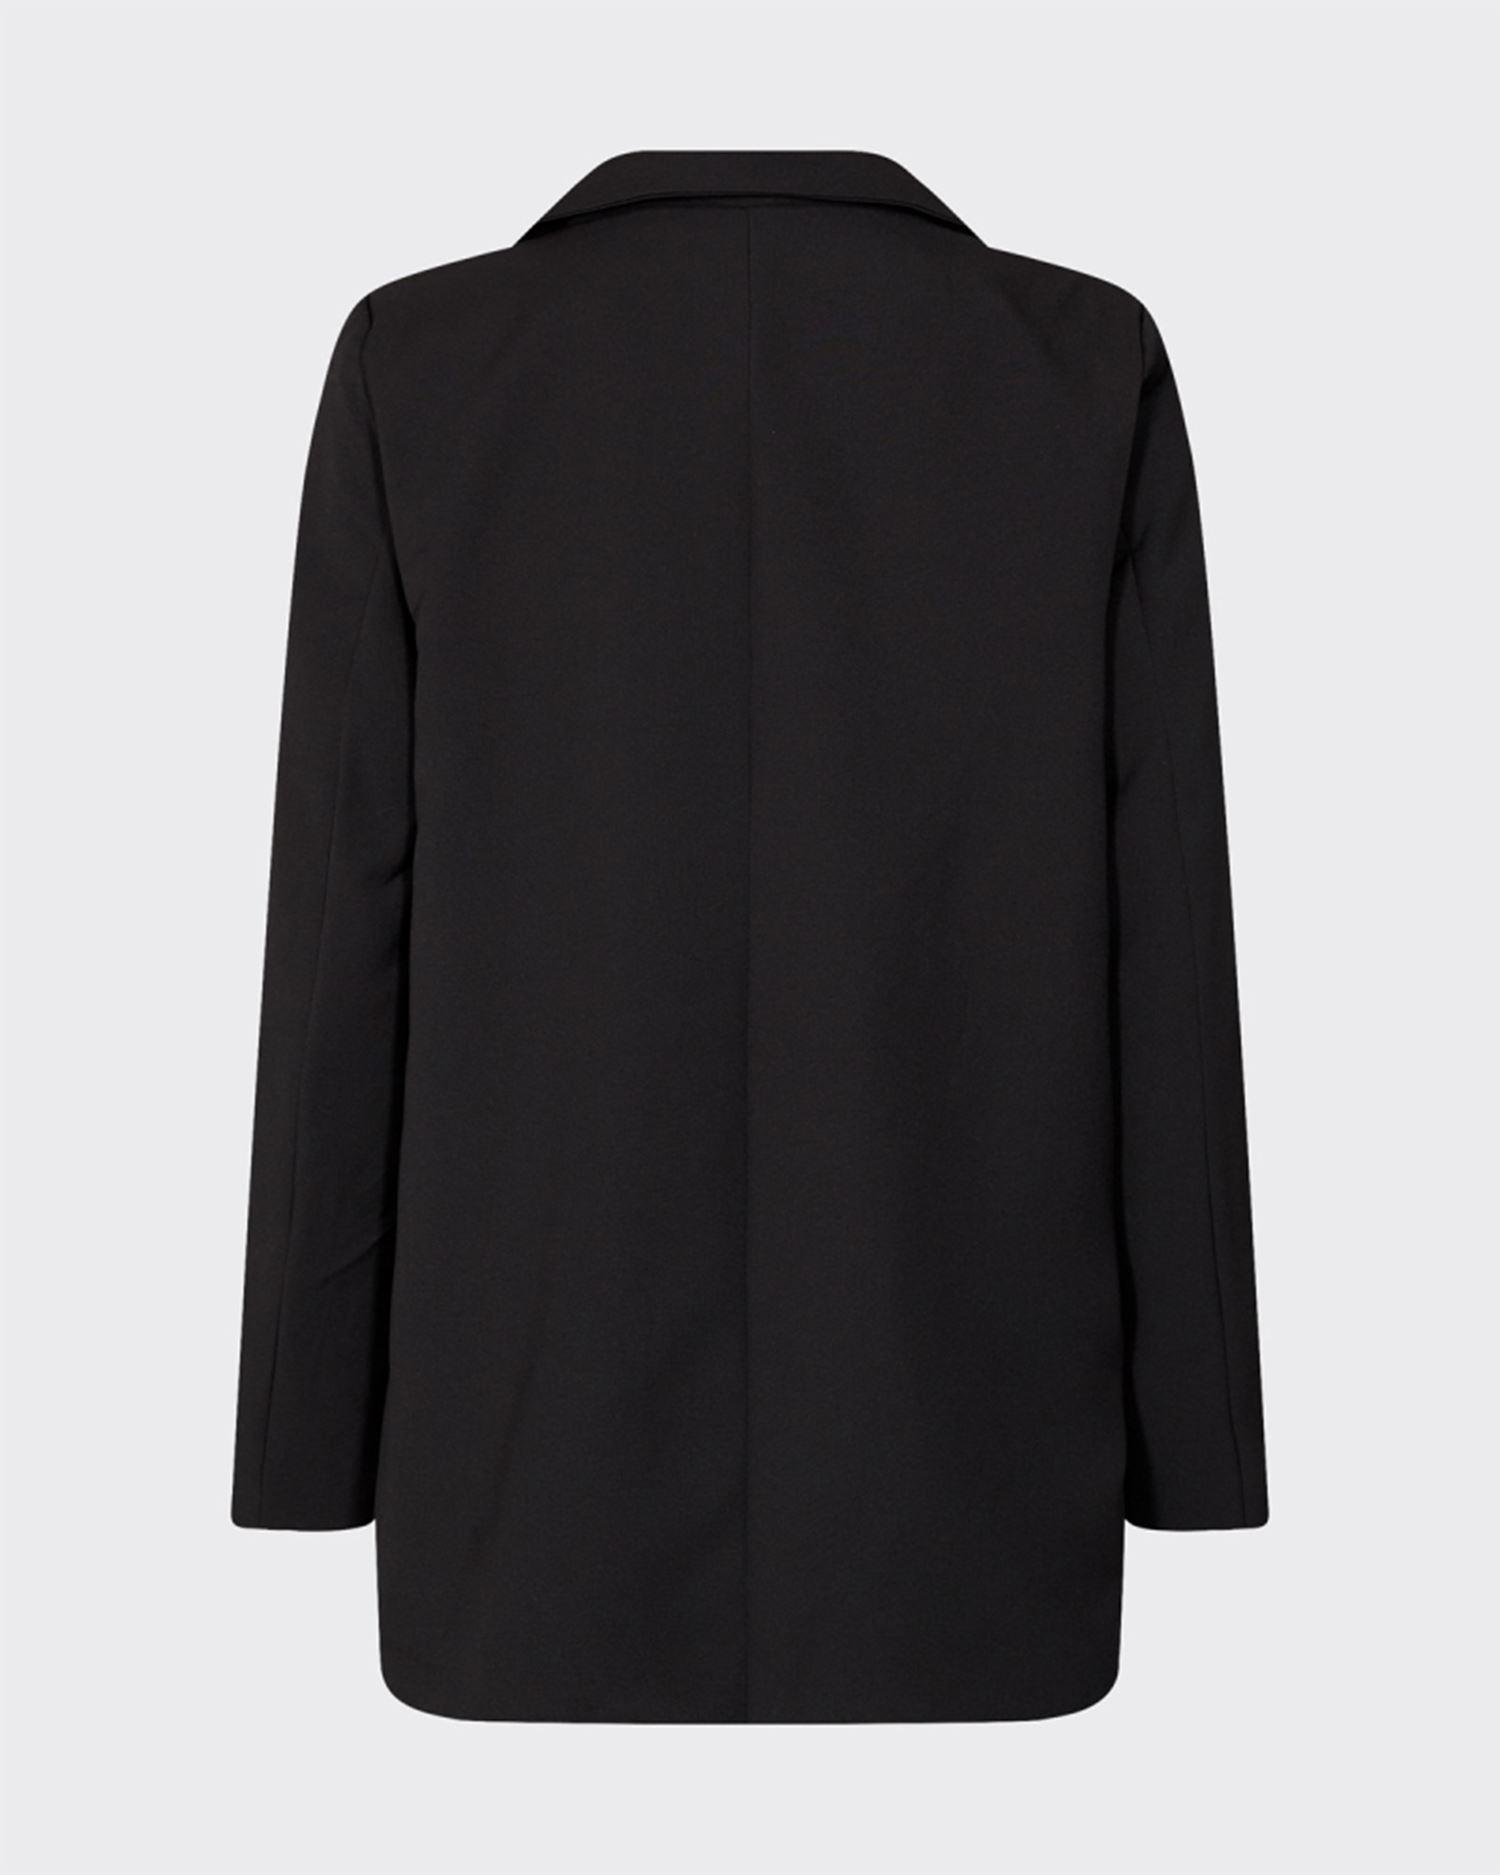 Moves Saline blazer, black, 38